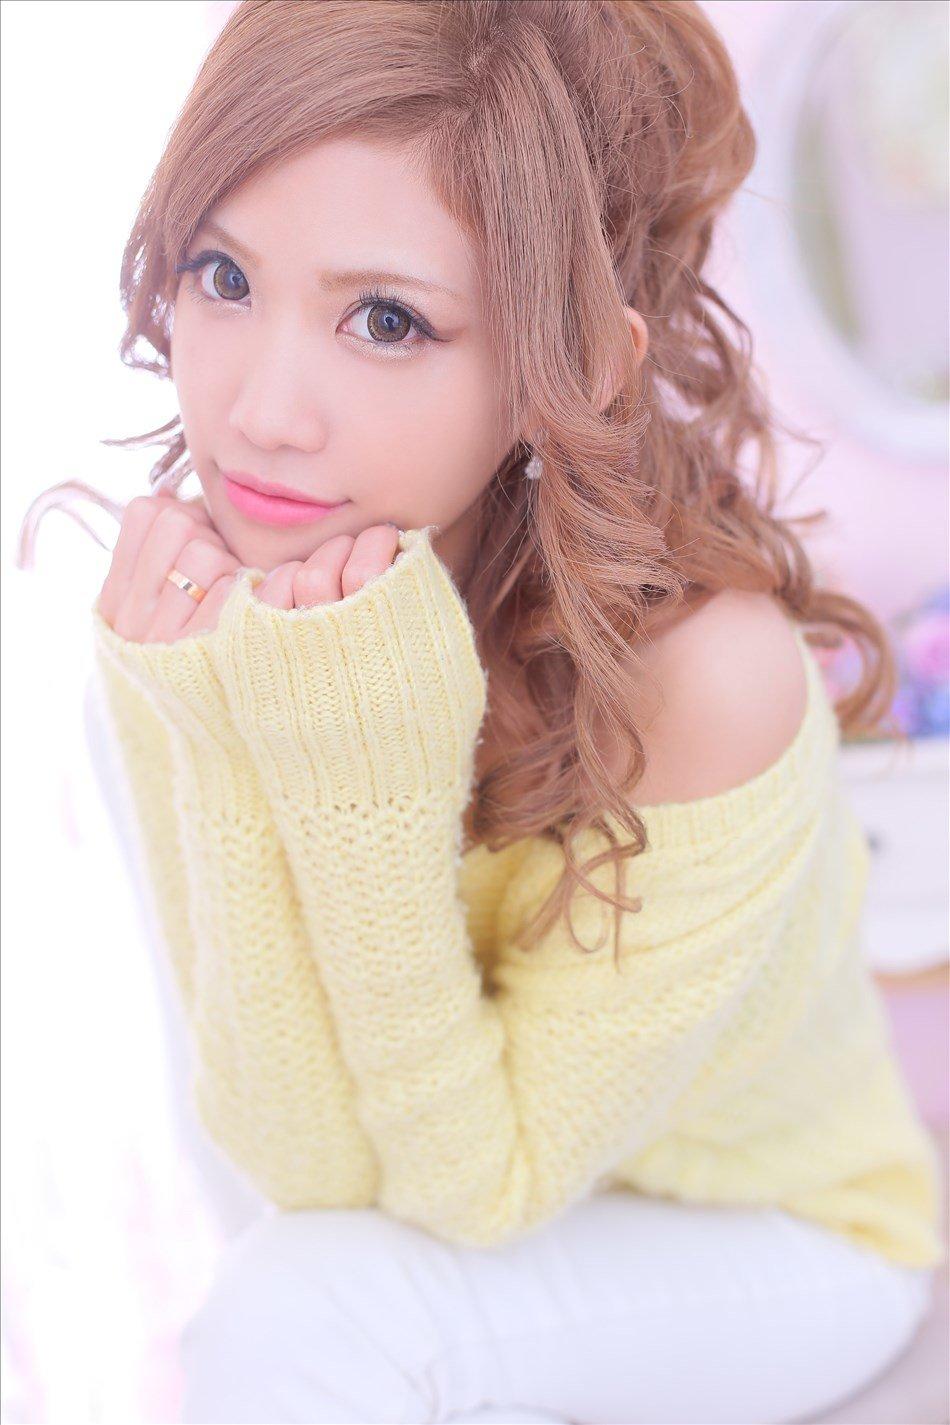 『STORY』の注目嬢マナちゃんはツンデレ肉食系美女ッ!?